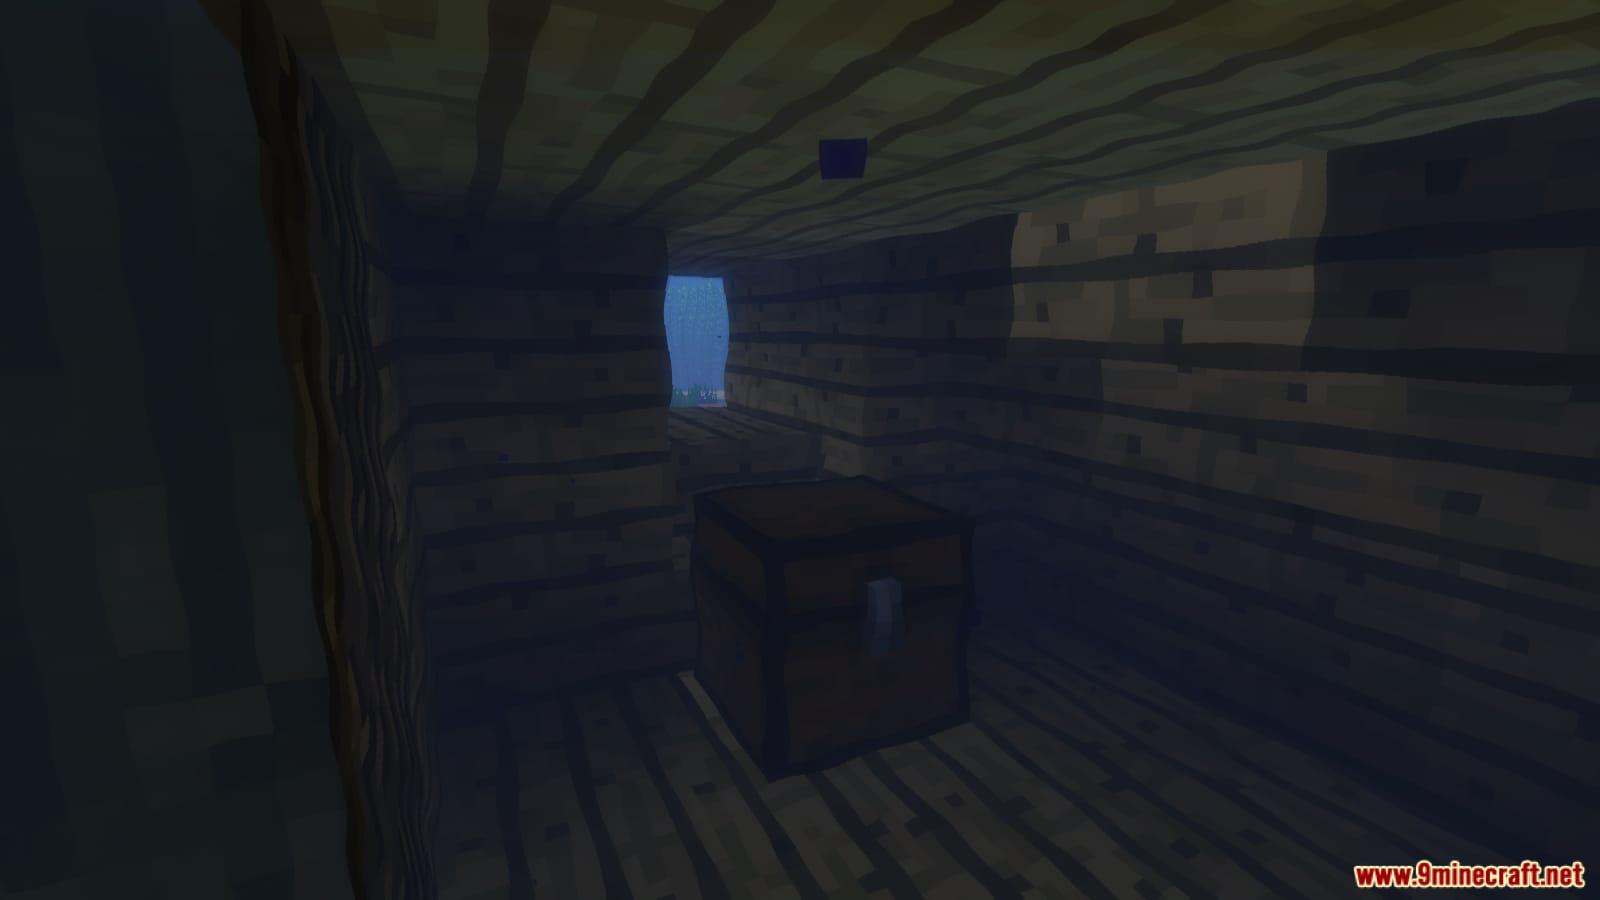 Survival Island Ocean Map 1.13.2 for Minecraft - 9Minecraft.Net